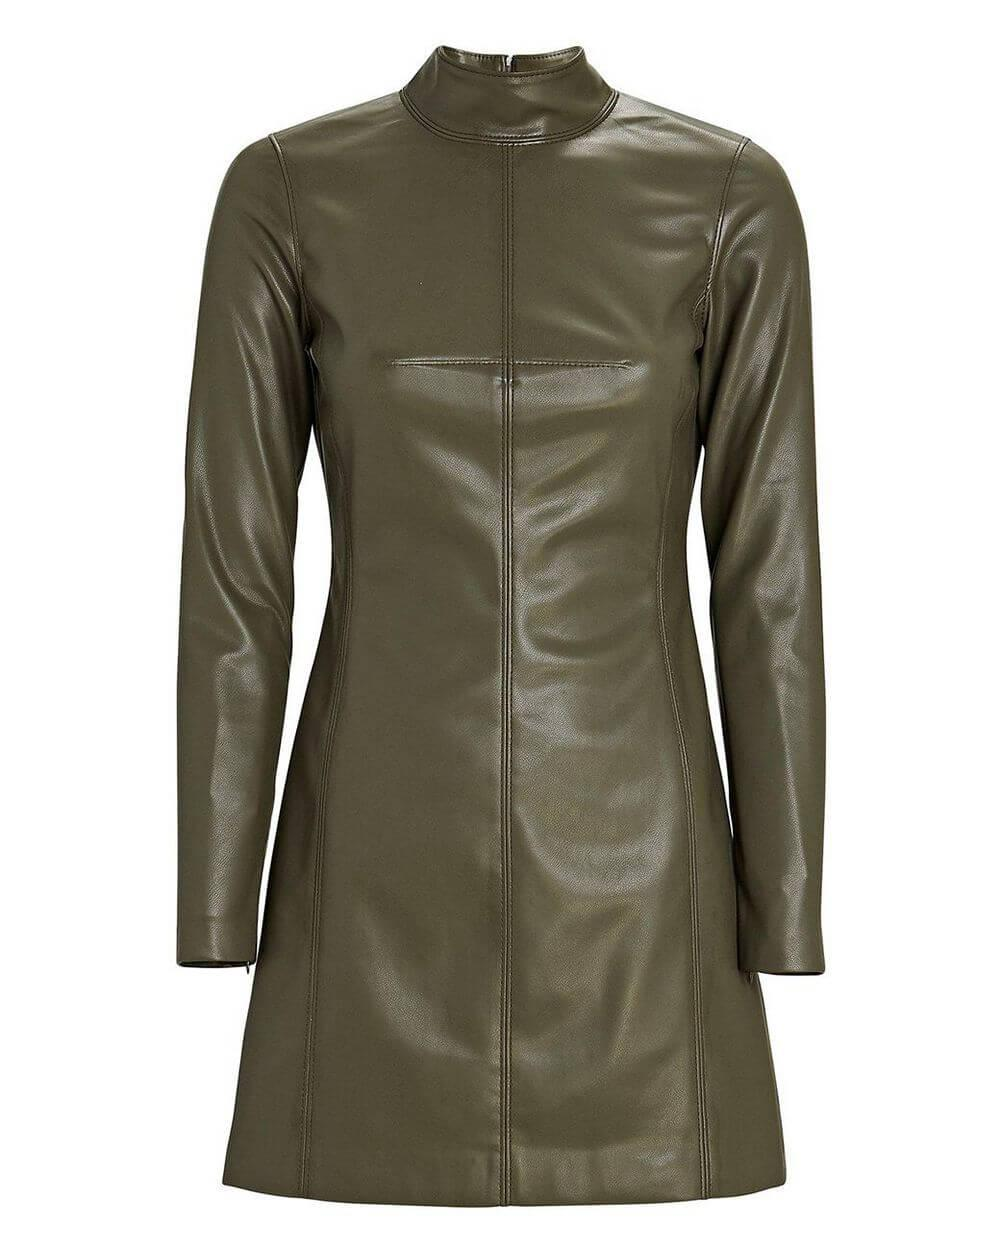 Misake Vegan Leather Dress Item # MISAKE